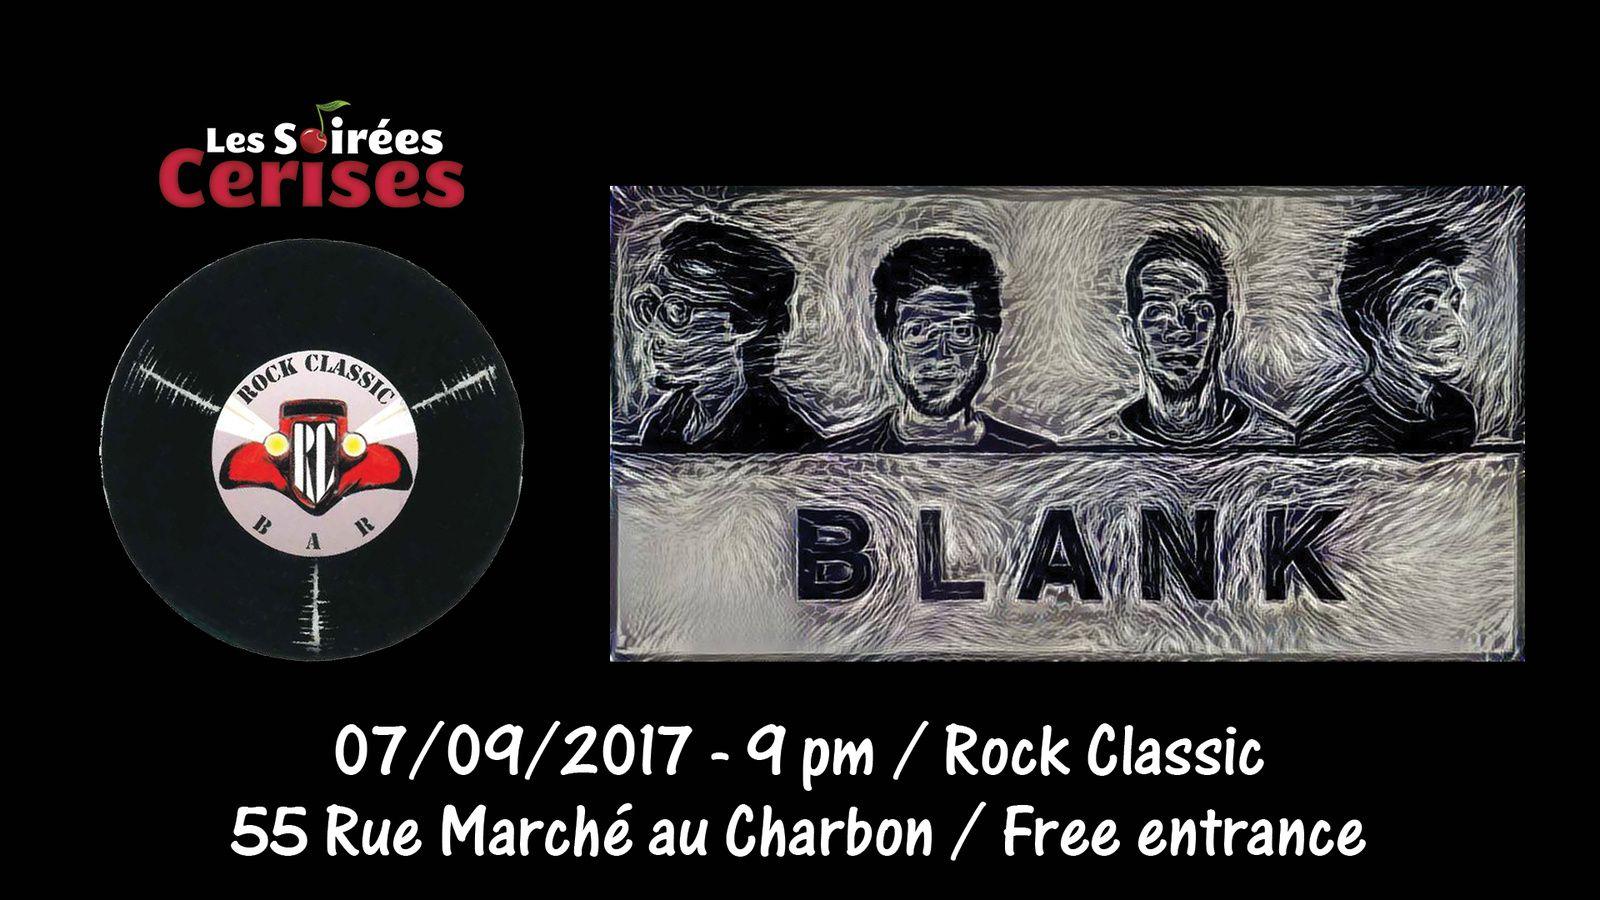 004 Historique Rock Classic 2017